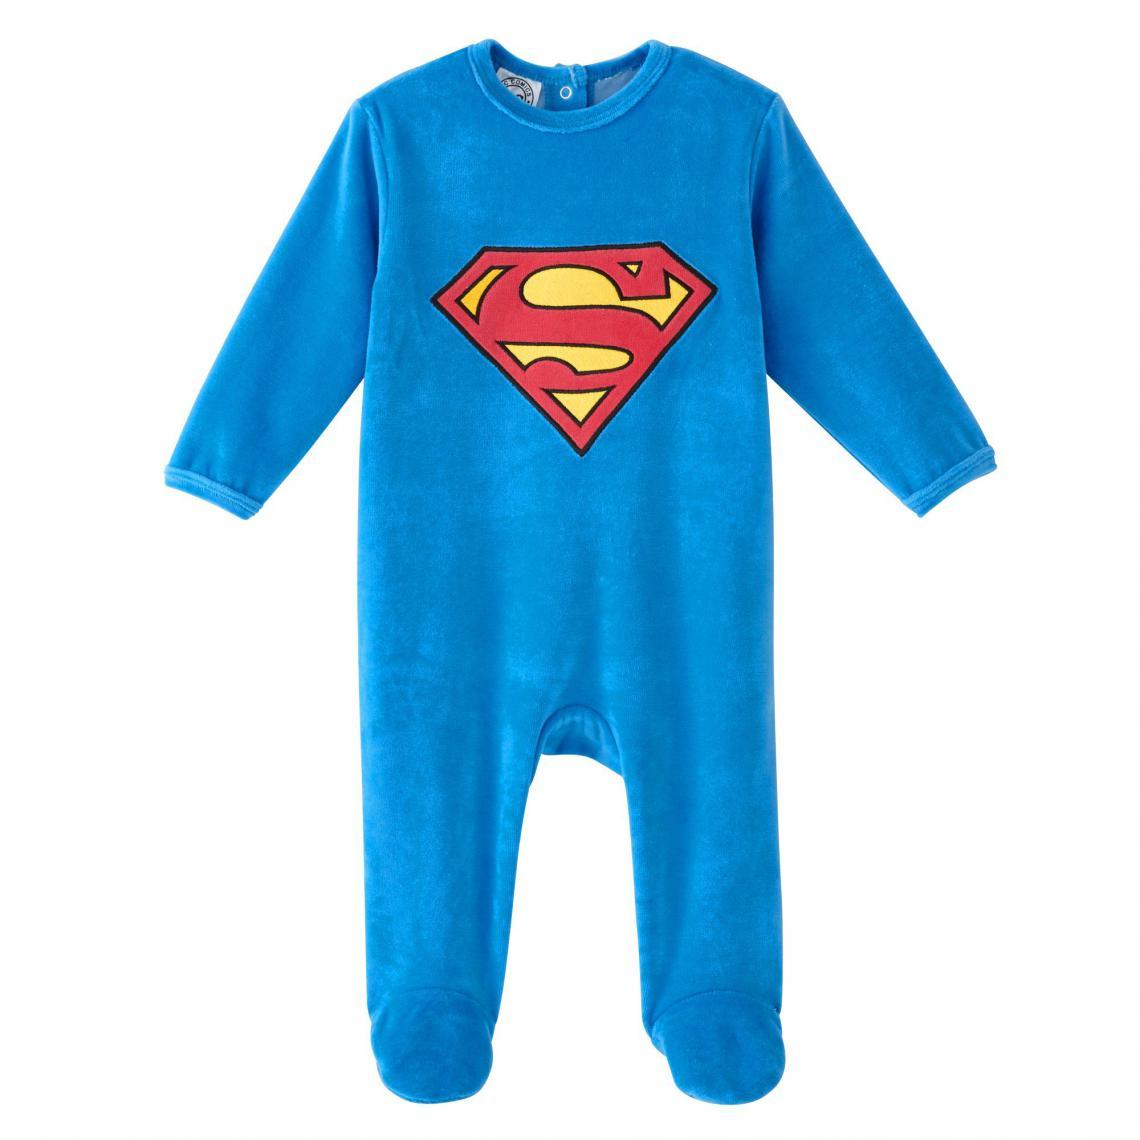 Dors bien velours b�b� gar�on Superman - bleu fonc� - 3Suisses